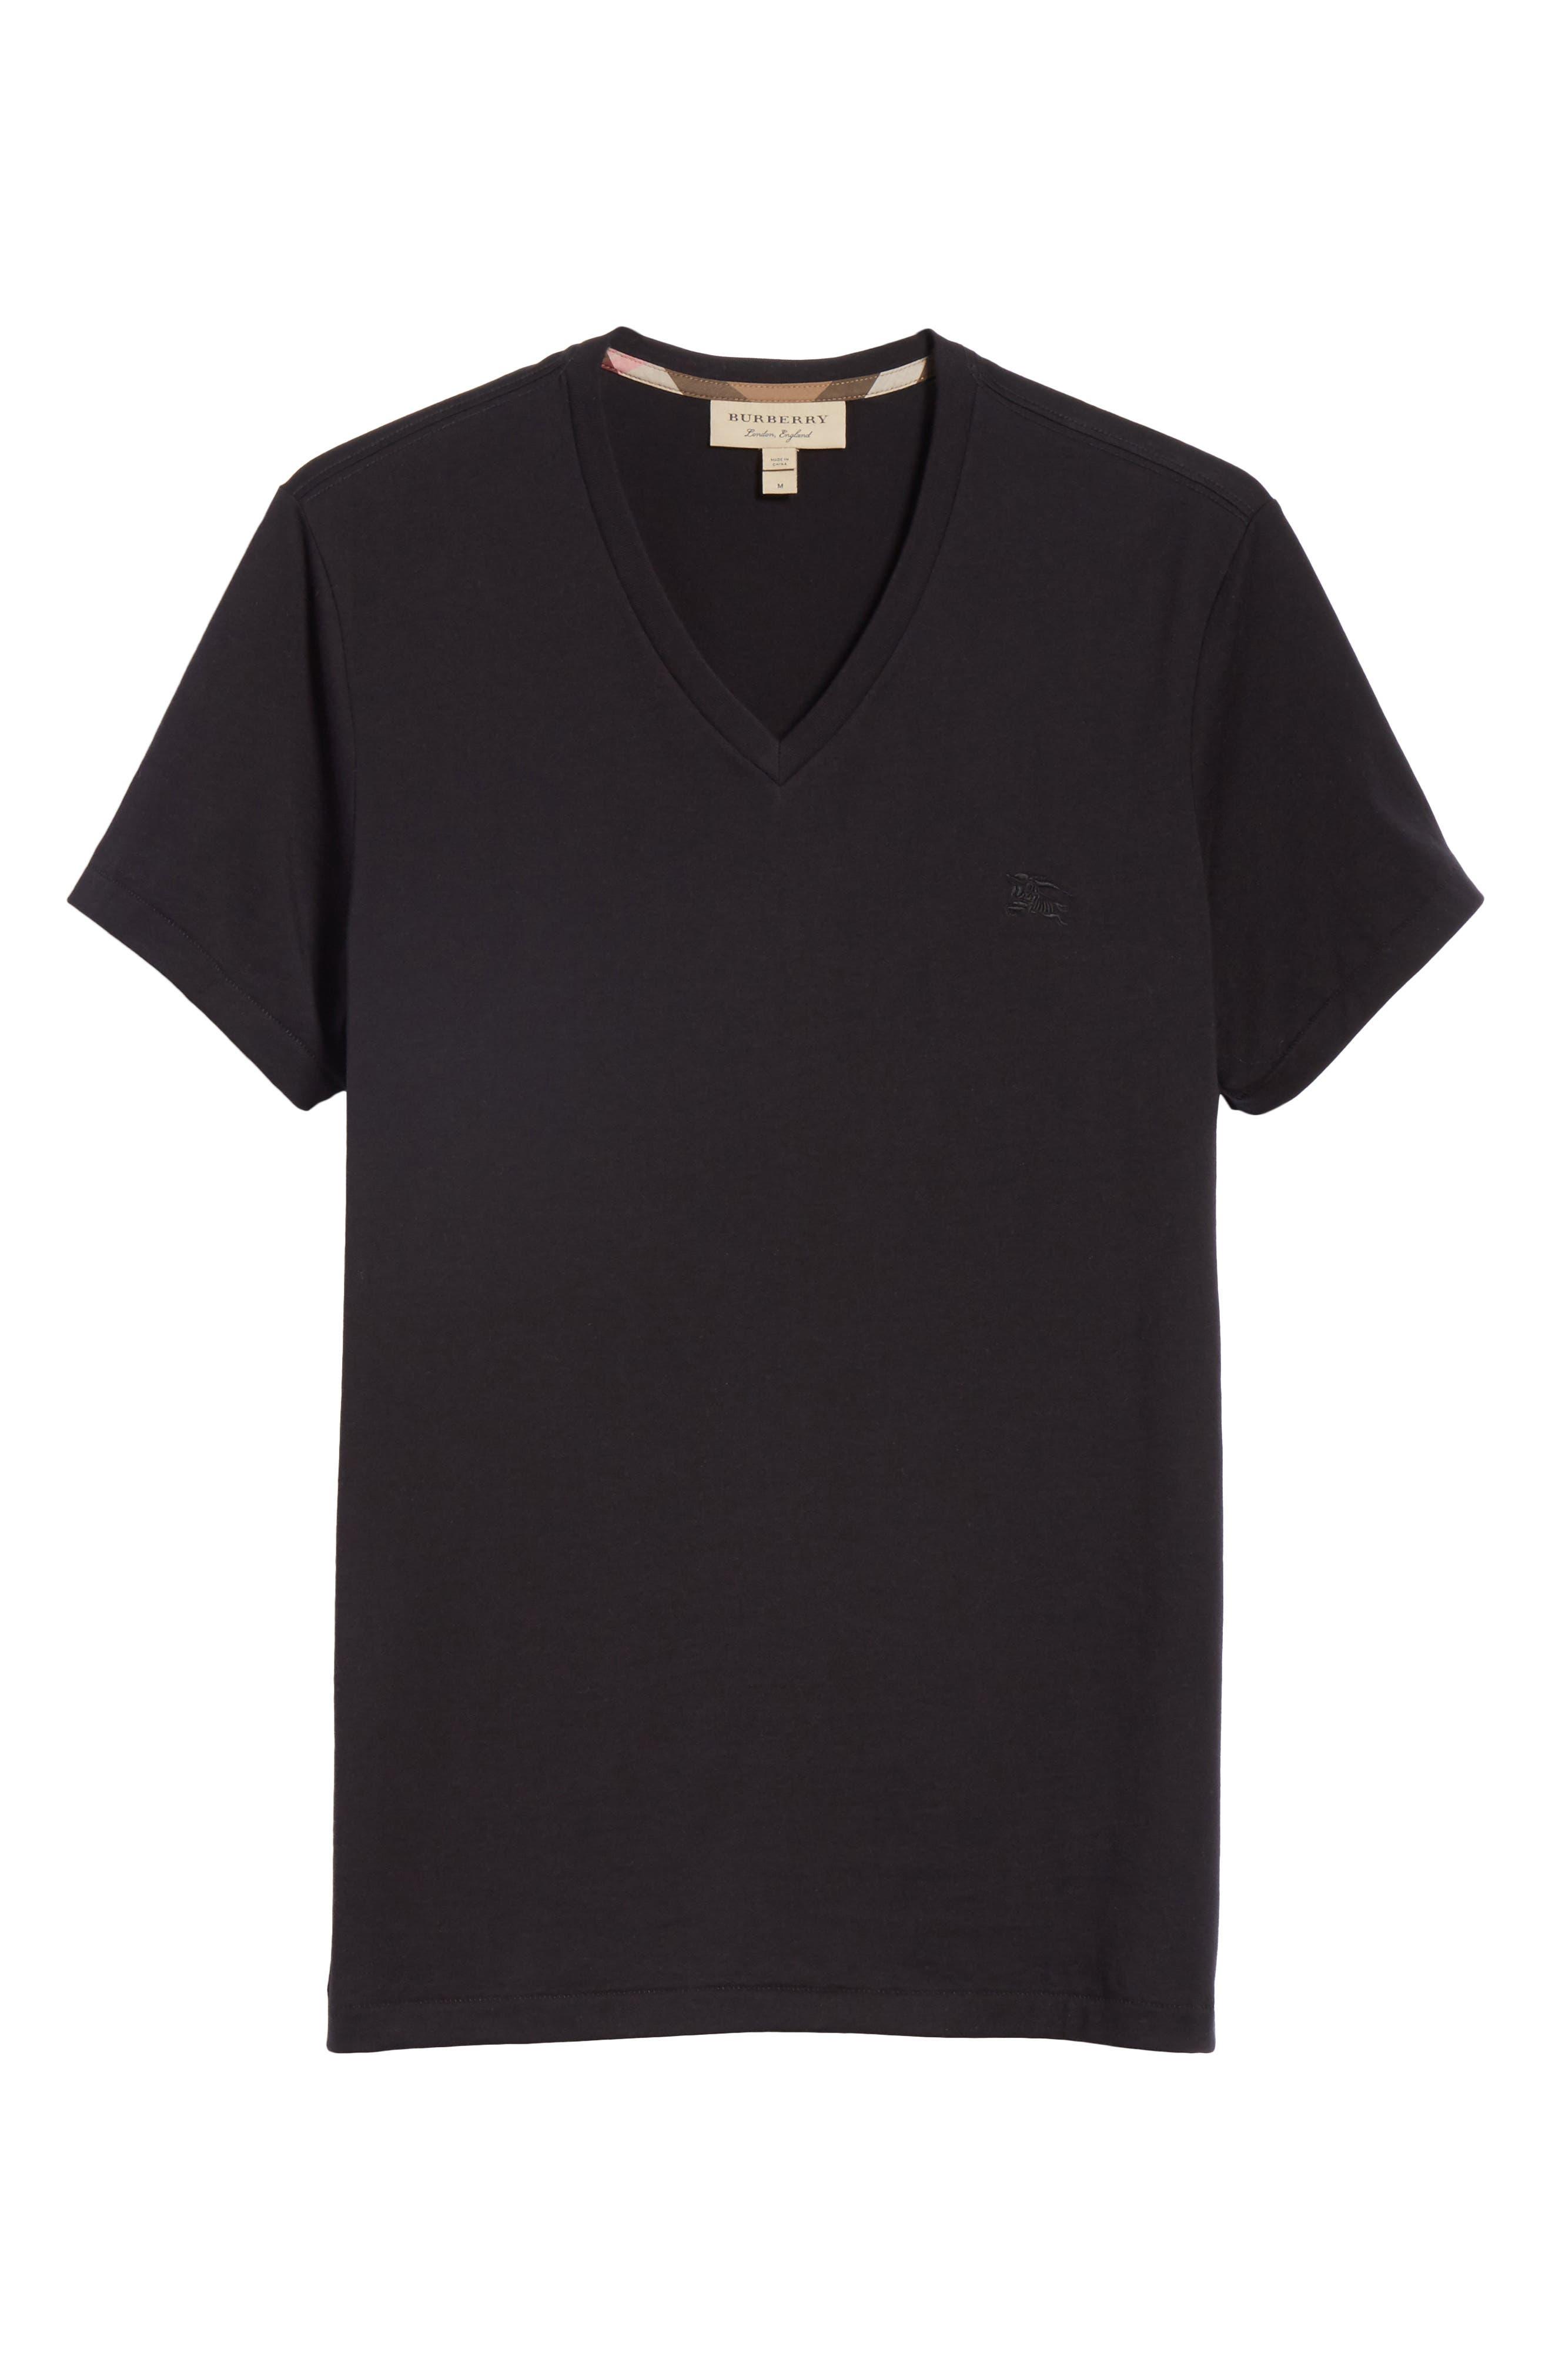 Jadforth V-Neck T-Shirt,                             Alternate thumbnail 6, color,                             BLACK